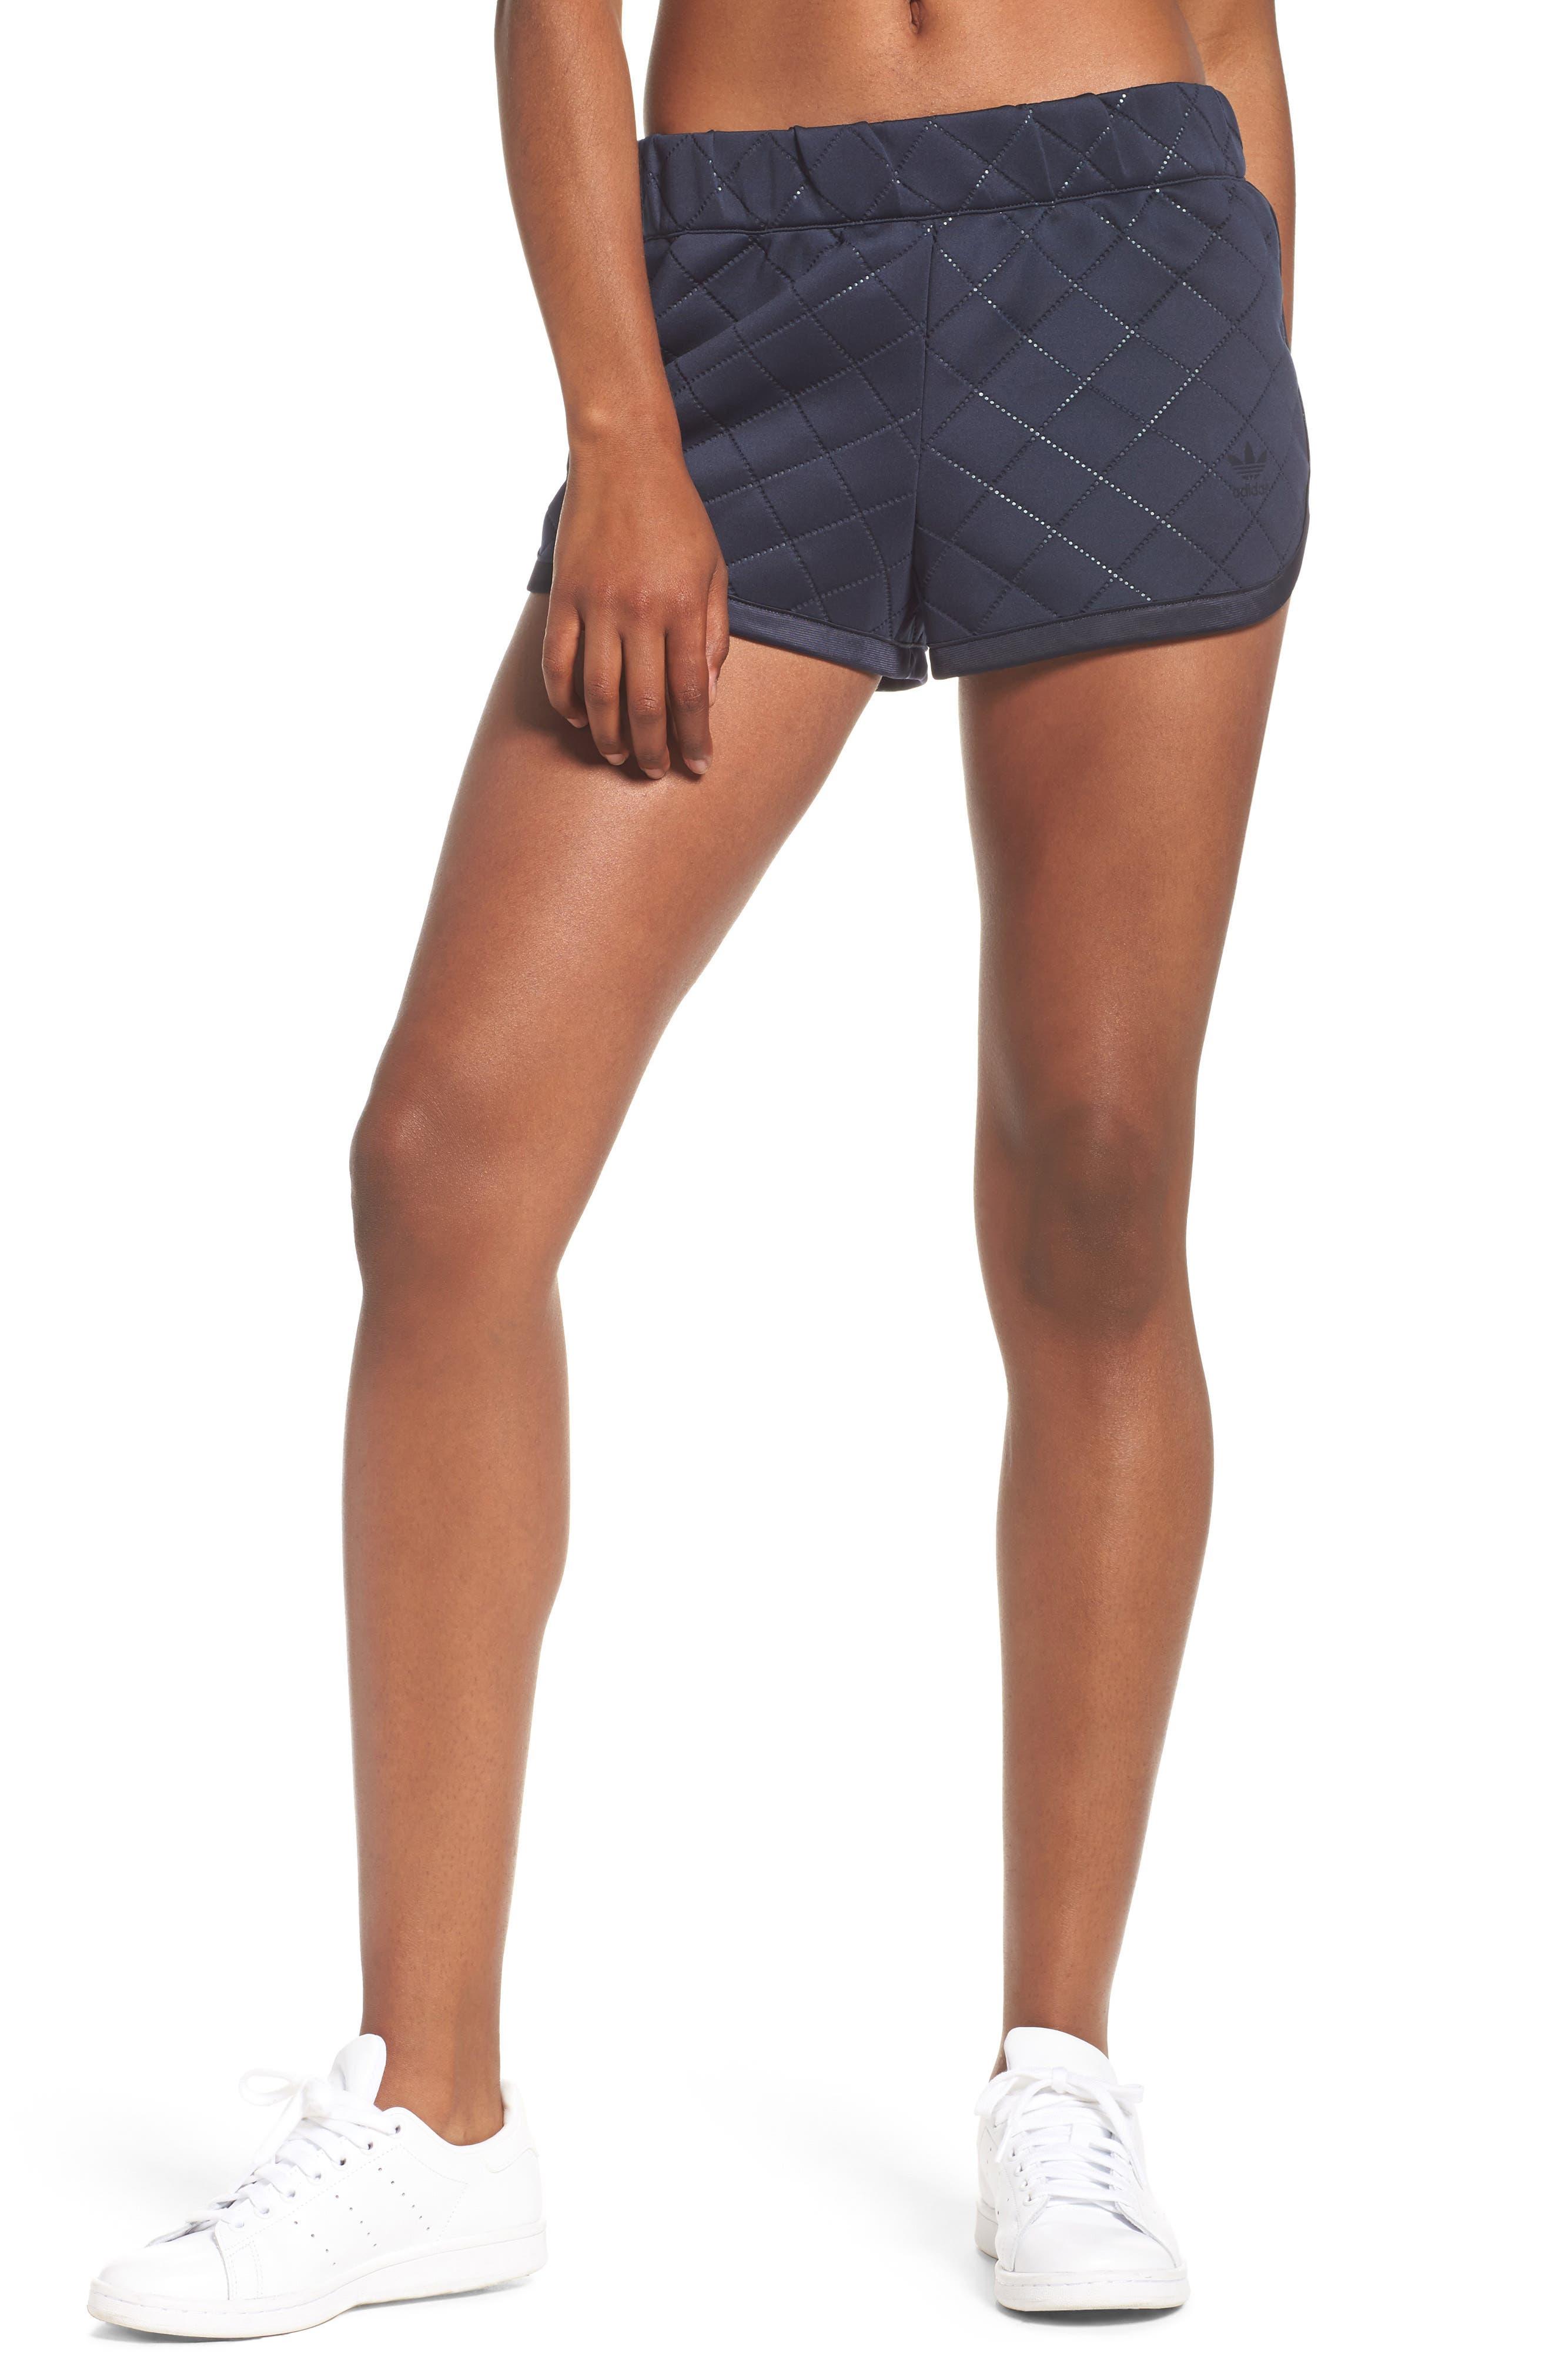 falda Gladys esposizione  adidas | Originals NMD Shorts | Nordstrom Rack